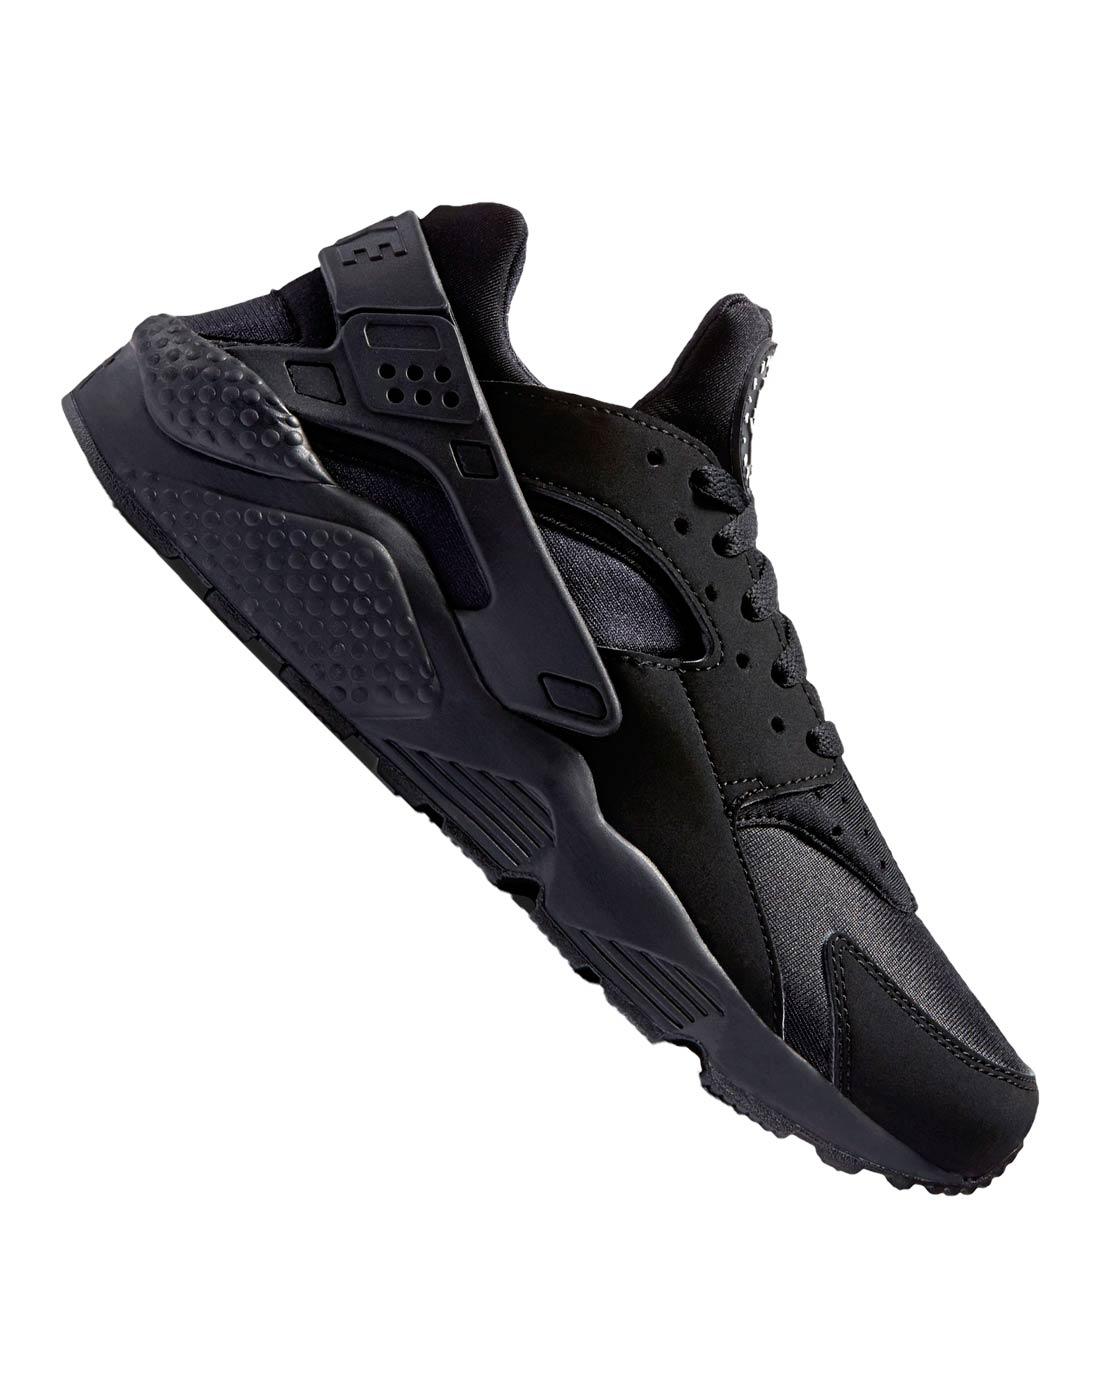 Nike Mens Air Huarache - Black | Life Style Sports IE